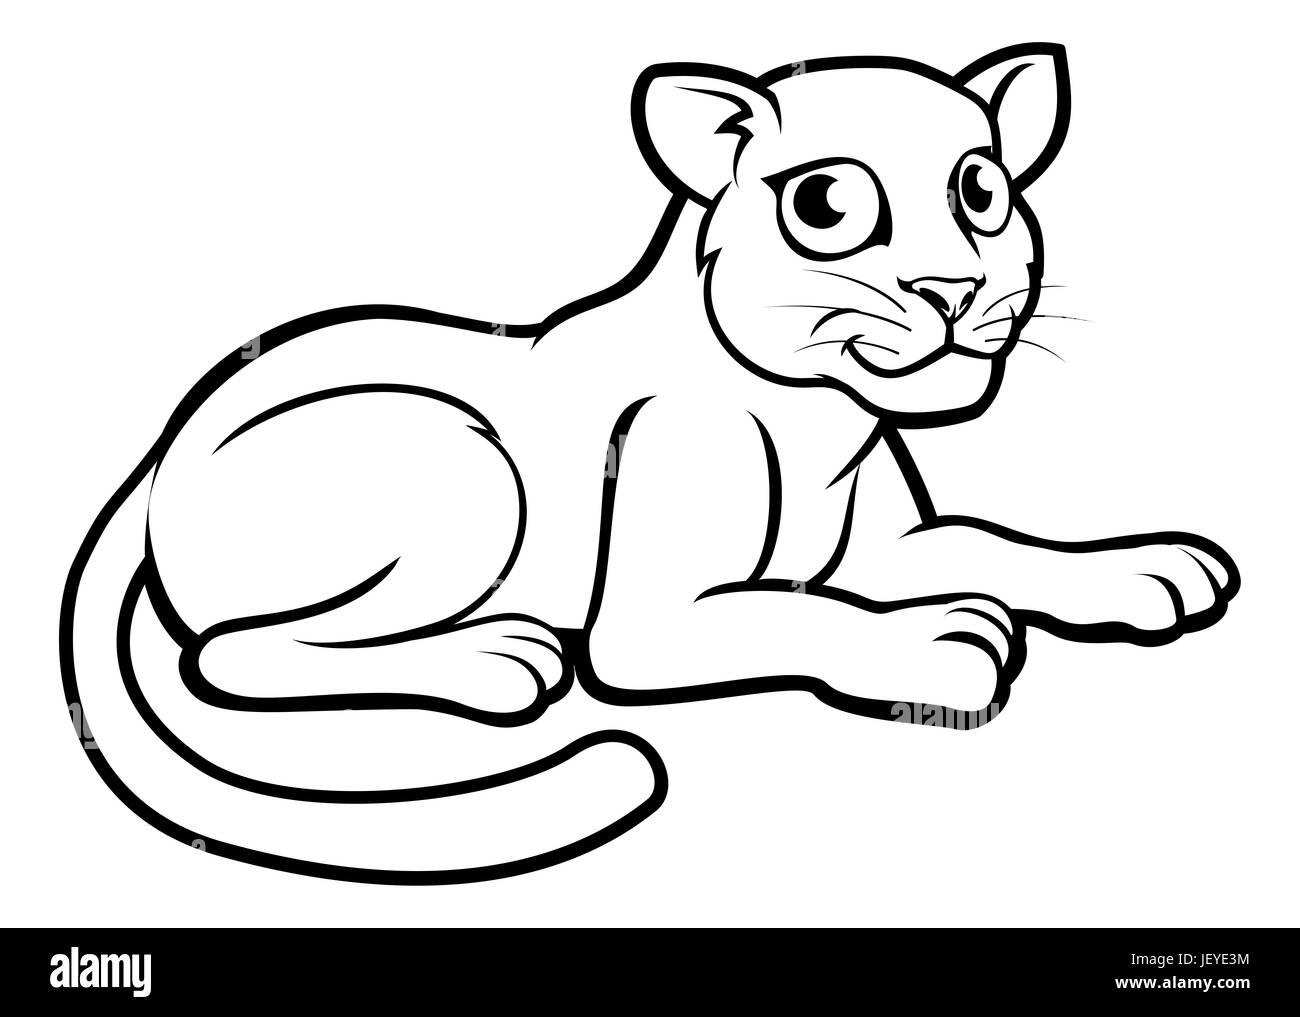 Un Leopardo El Jaguar O Pantera Esbozo De Personaje De Dibujos